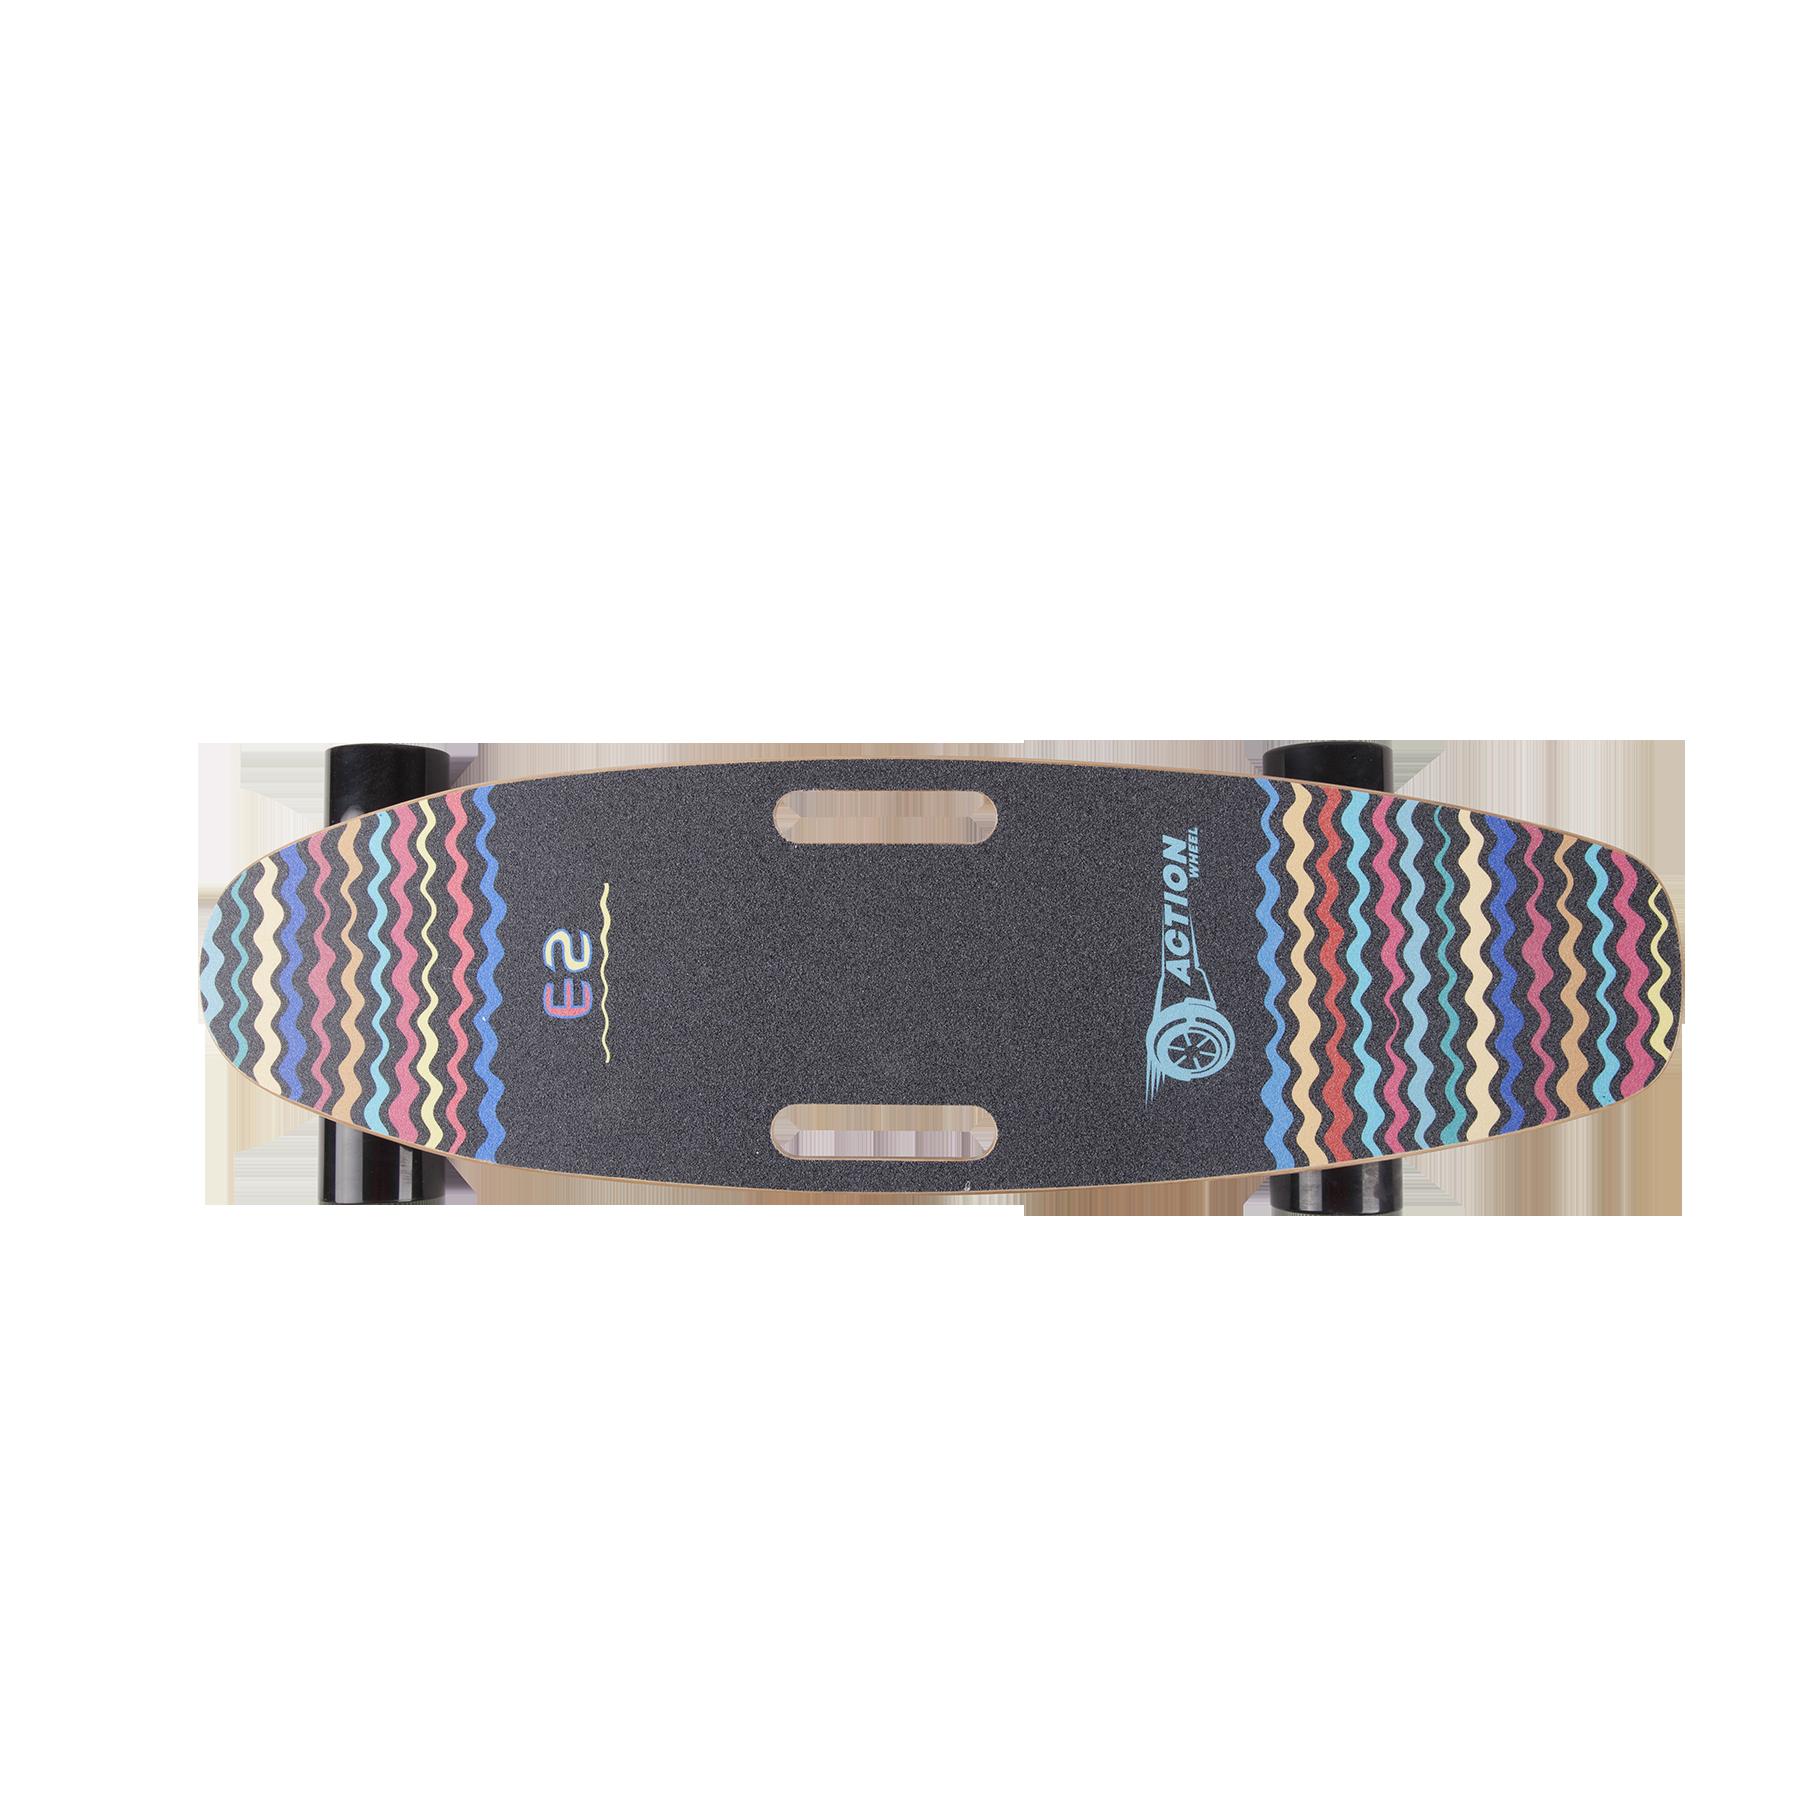 High Quality E-Skateboard Electric Skateboard 650mm 800mm